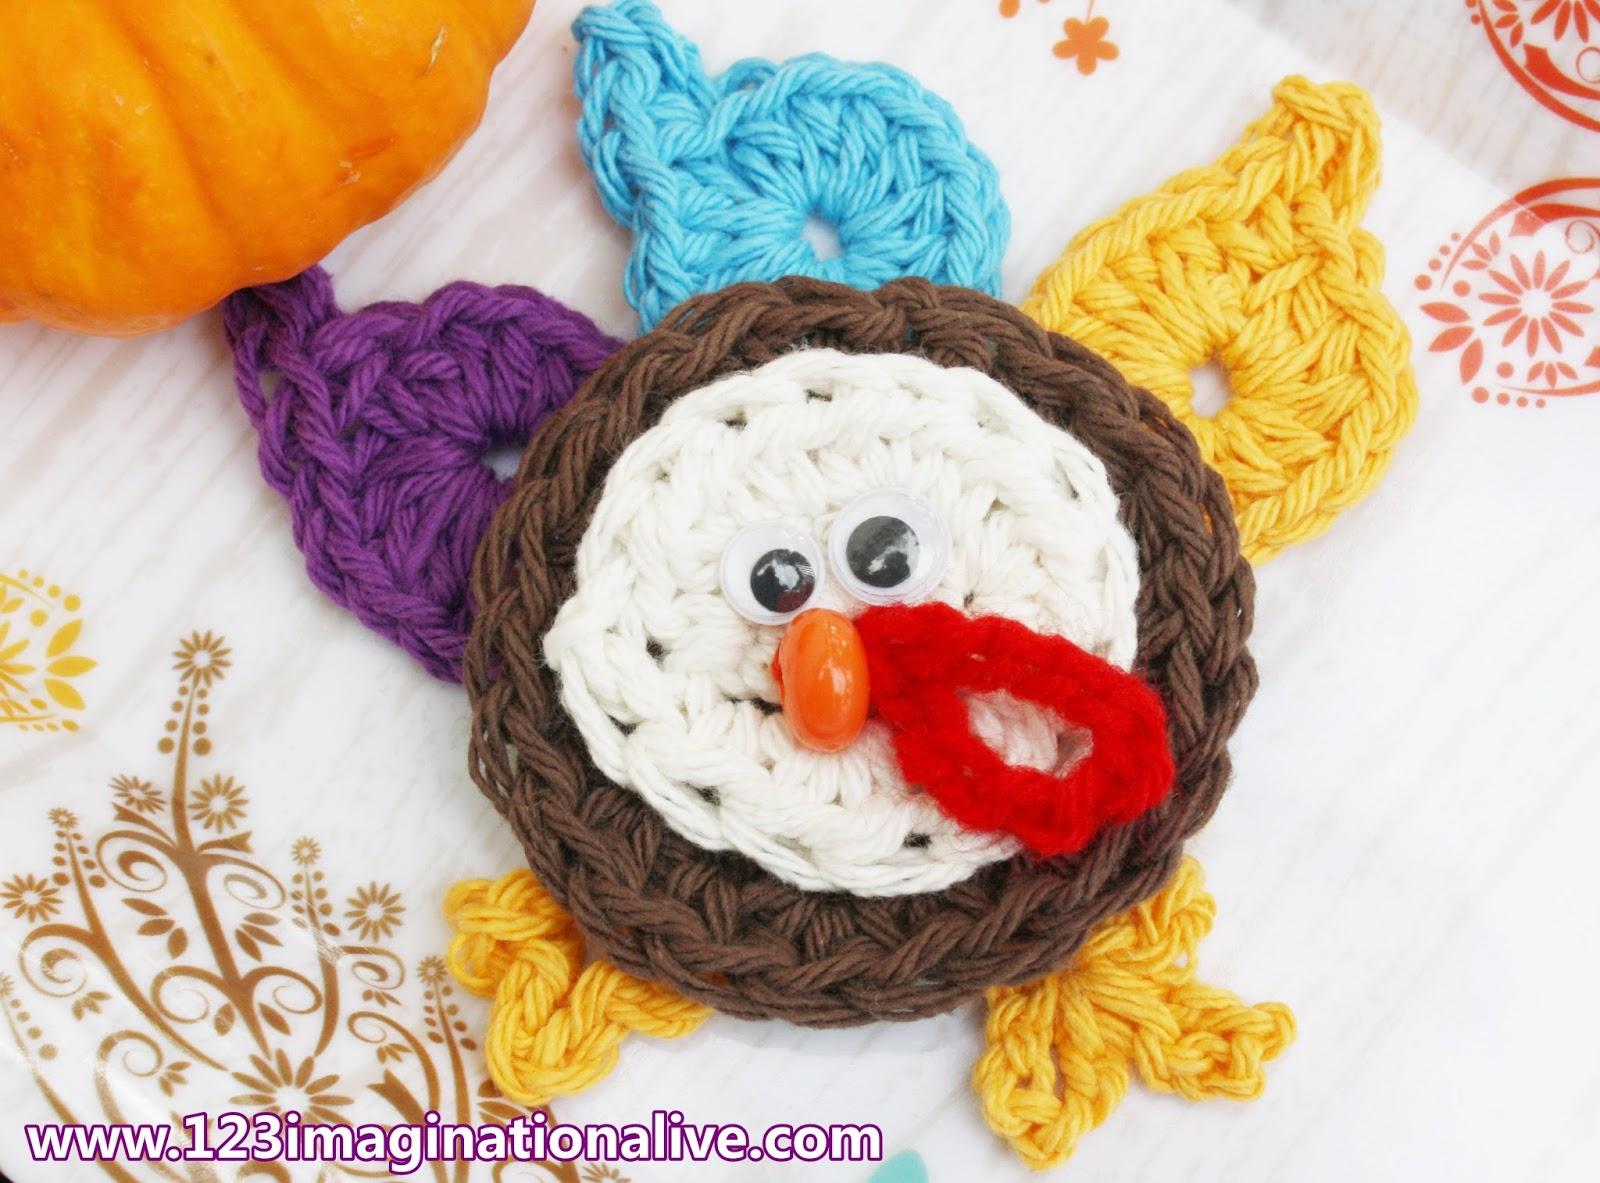 123imaginationalive How To Crochet A Turkey Applique